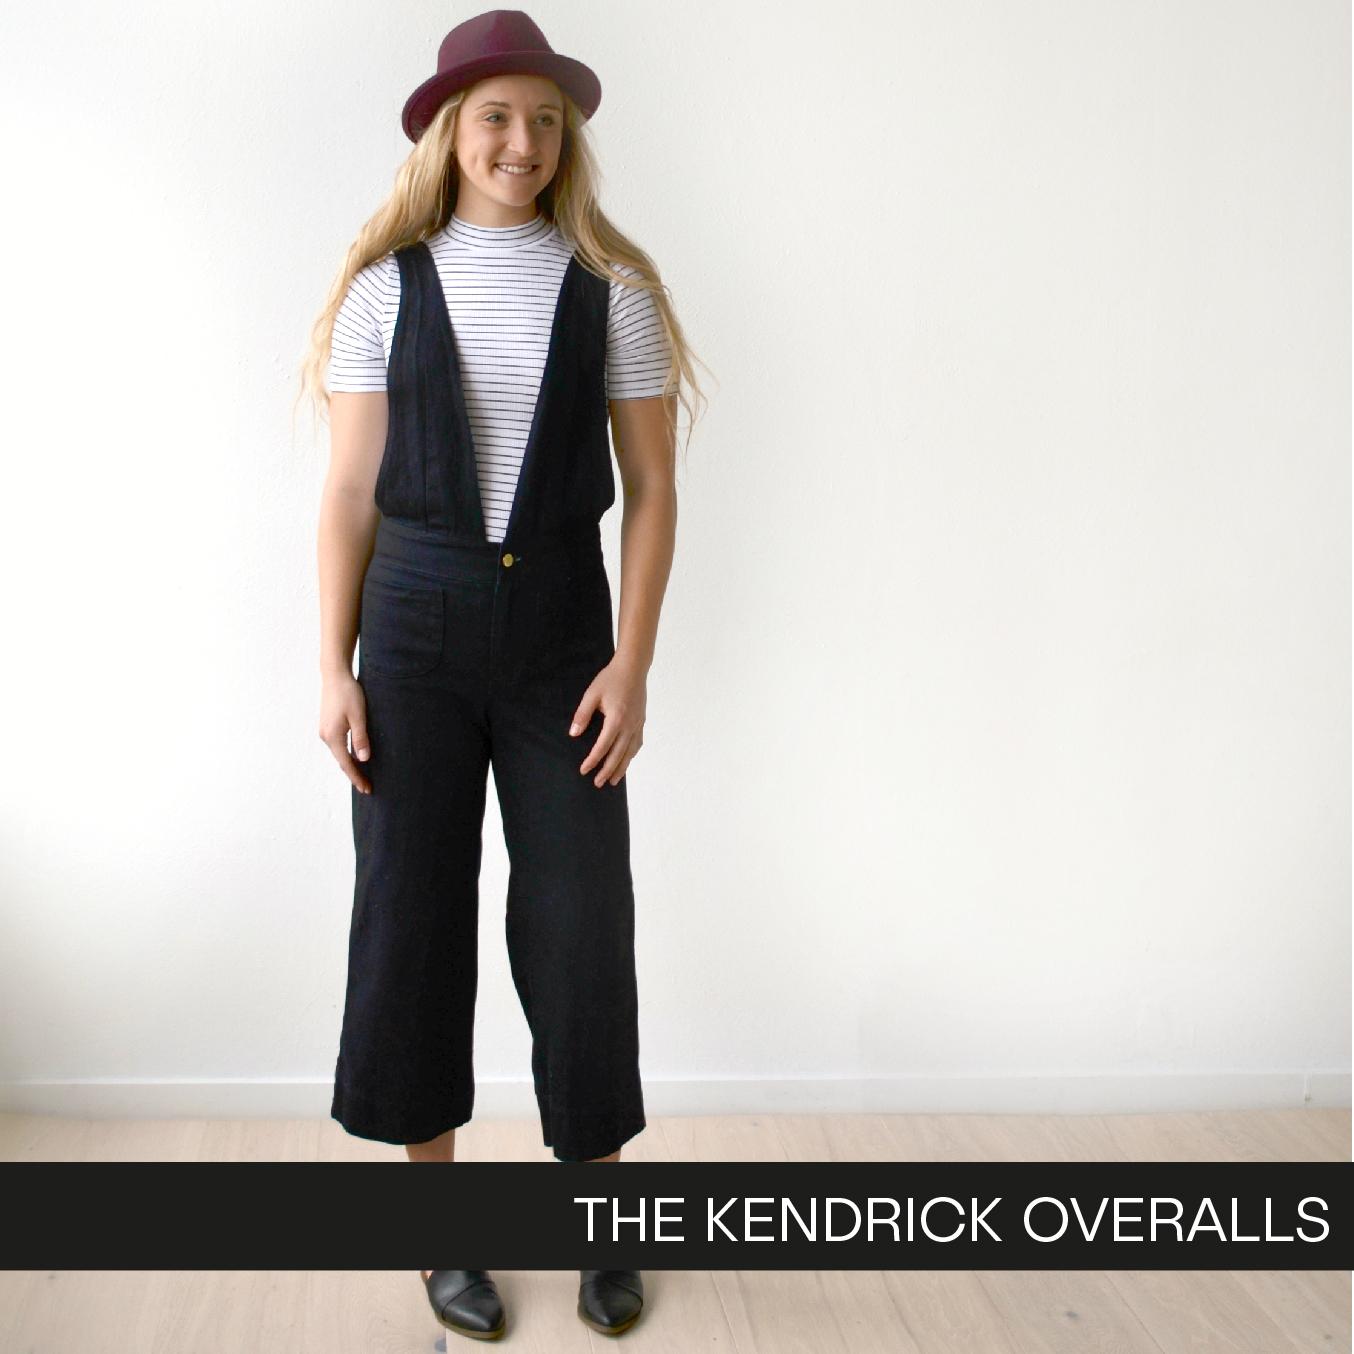 The Kendrick Overalls by Hey June Handmade